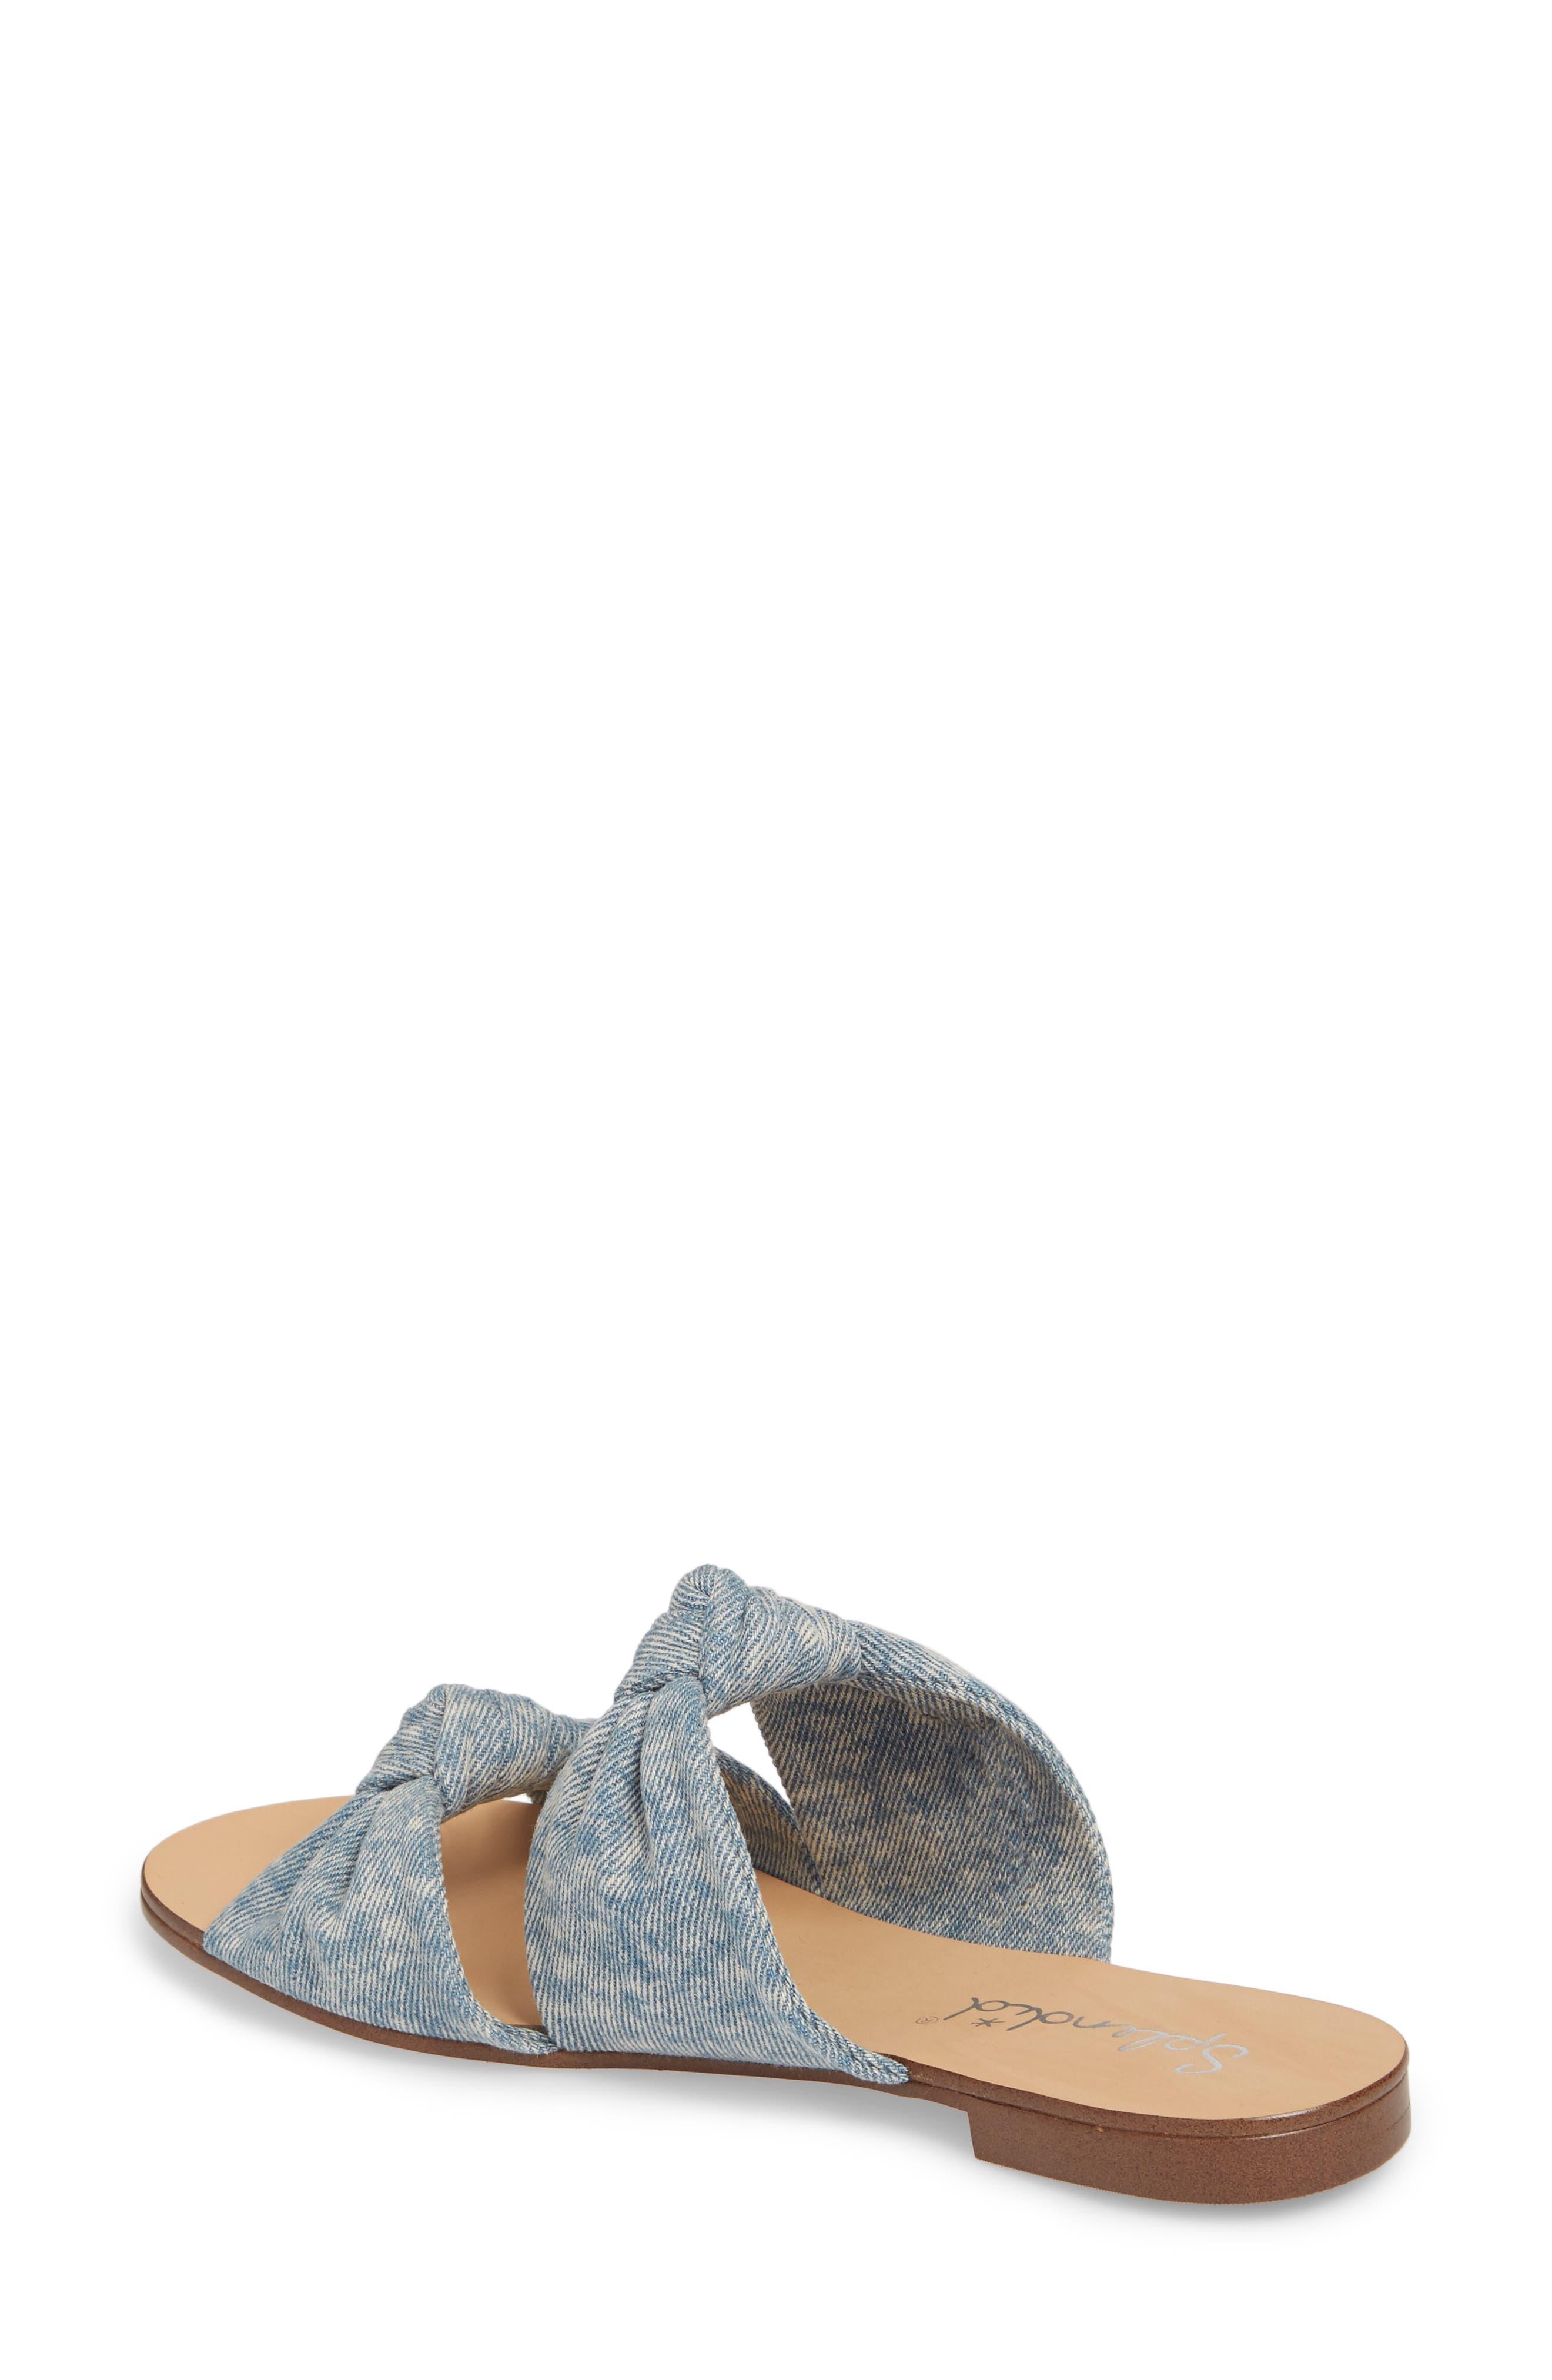 Barton Double Knotted Slide Sandal,                             Alternate thumbnail 2, color,                             Jean Fabric